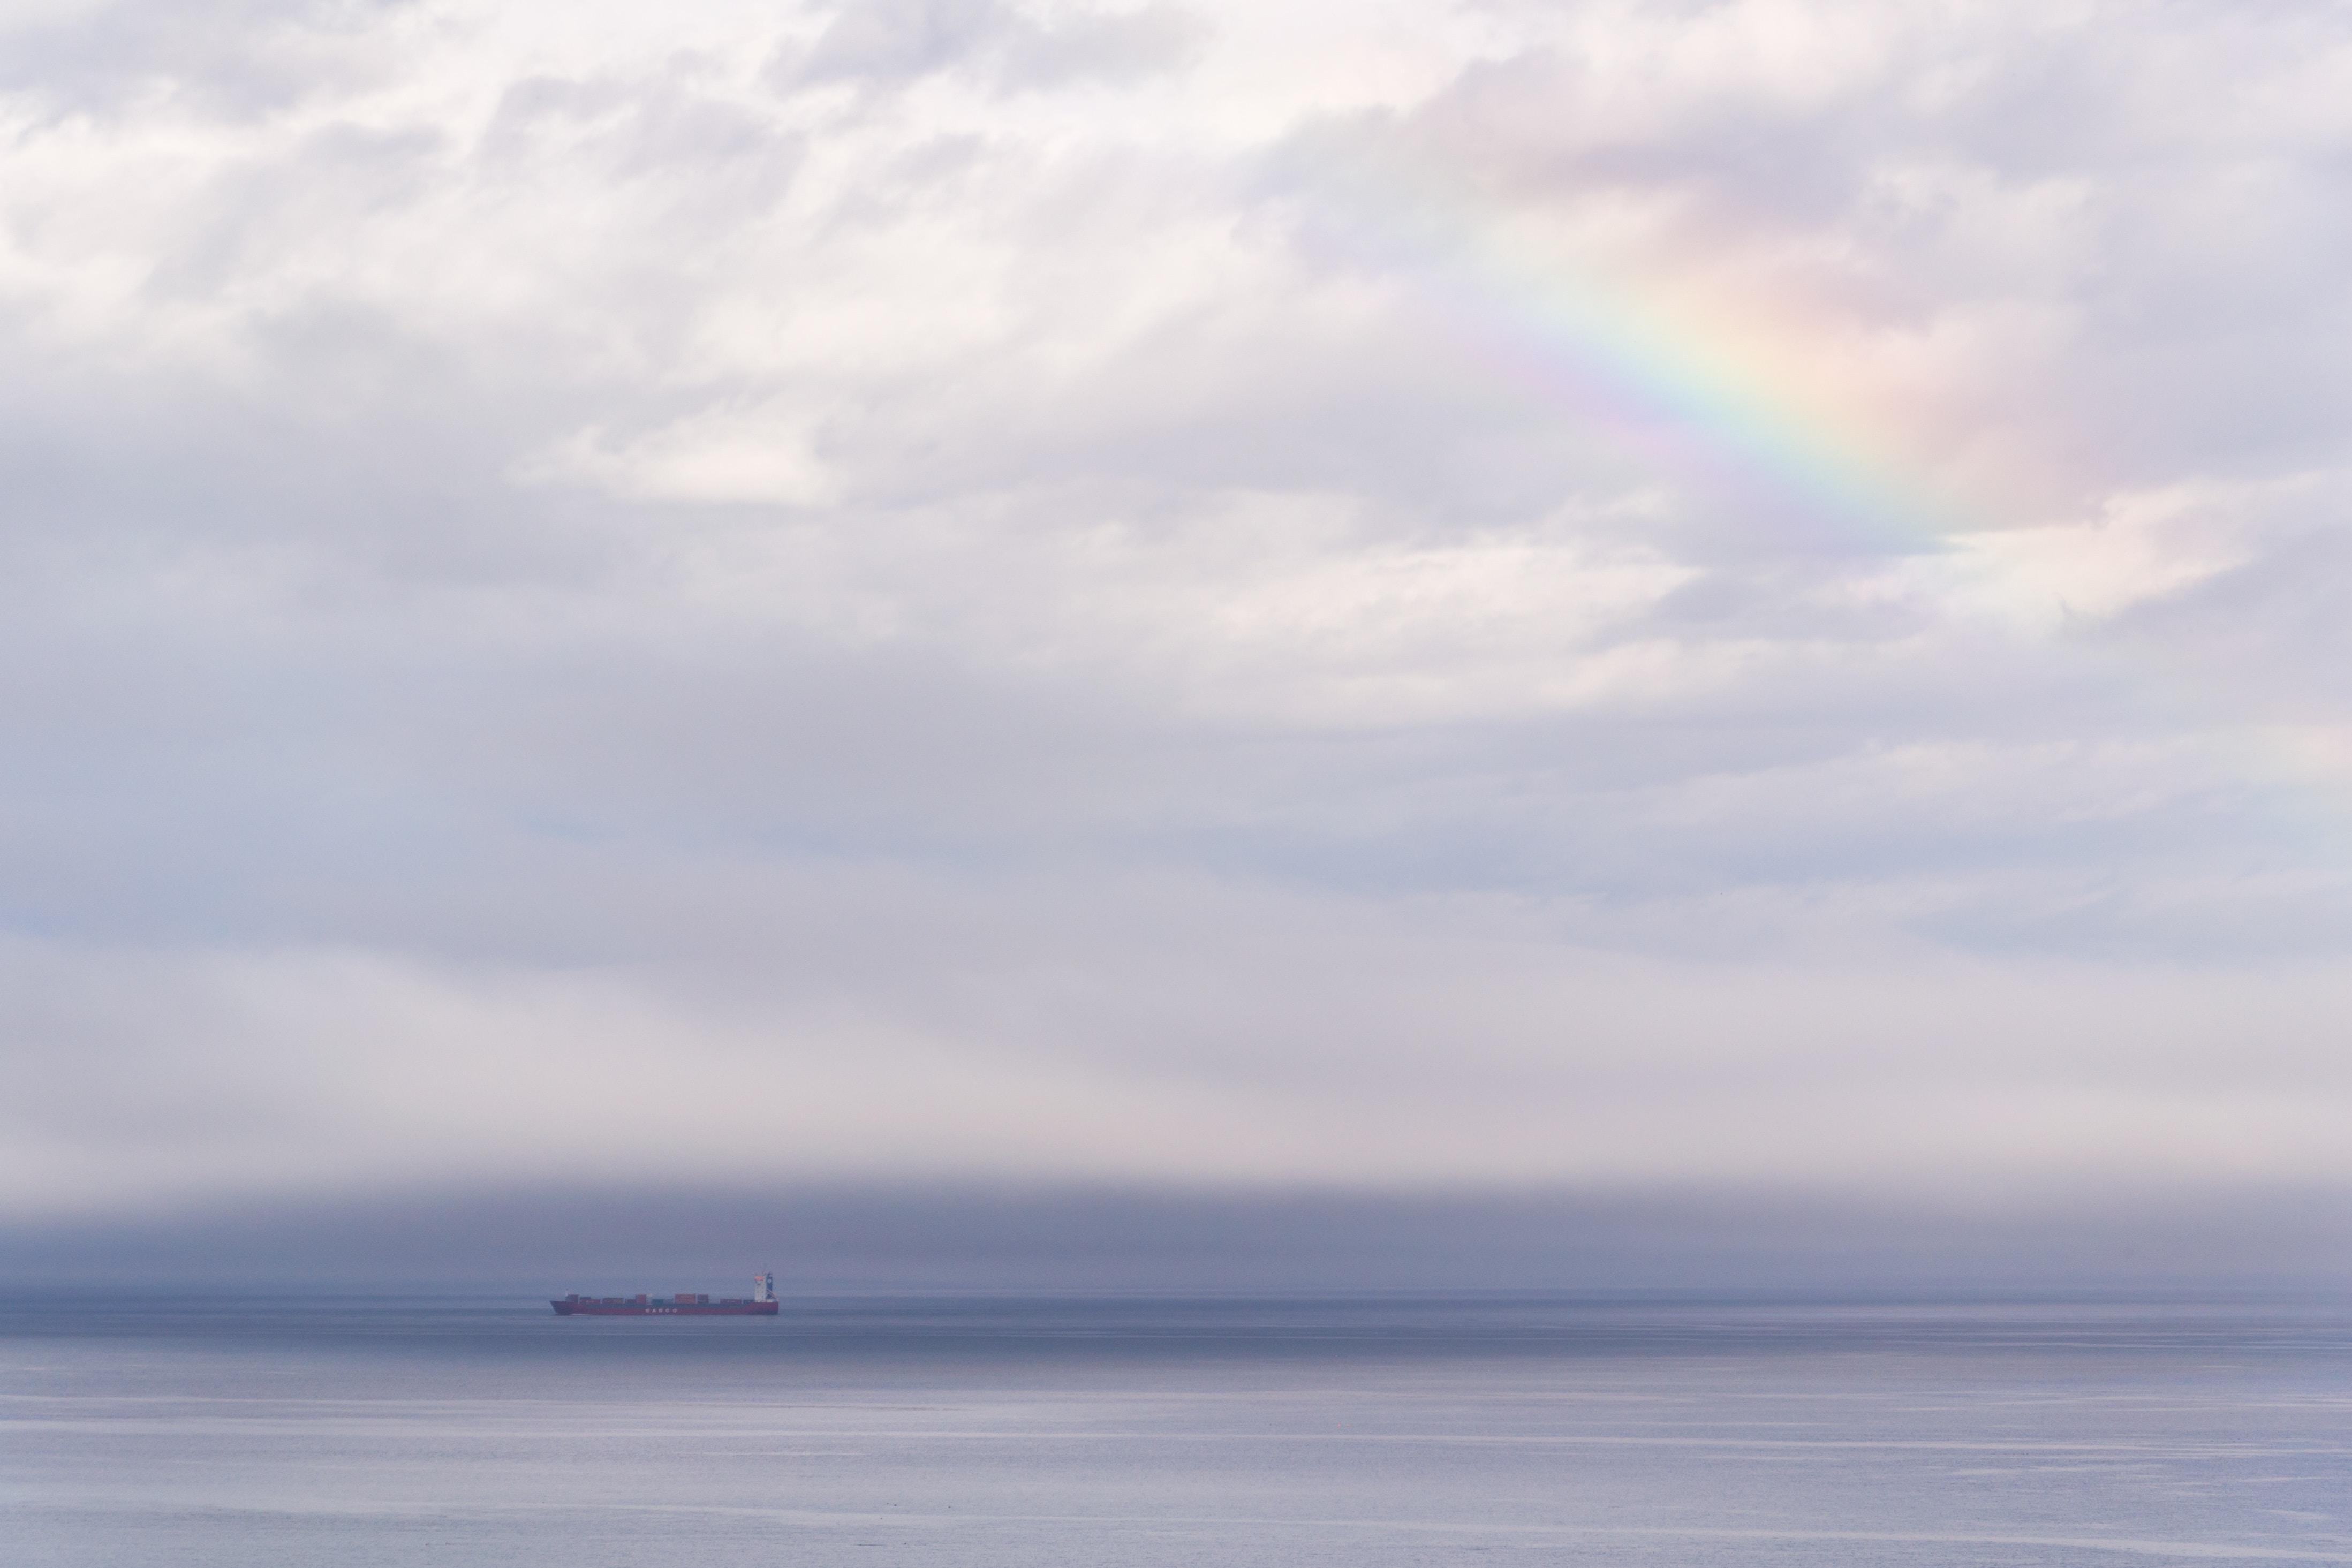 vessel on ocean under cloudy sky with rainbow